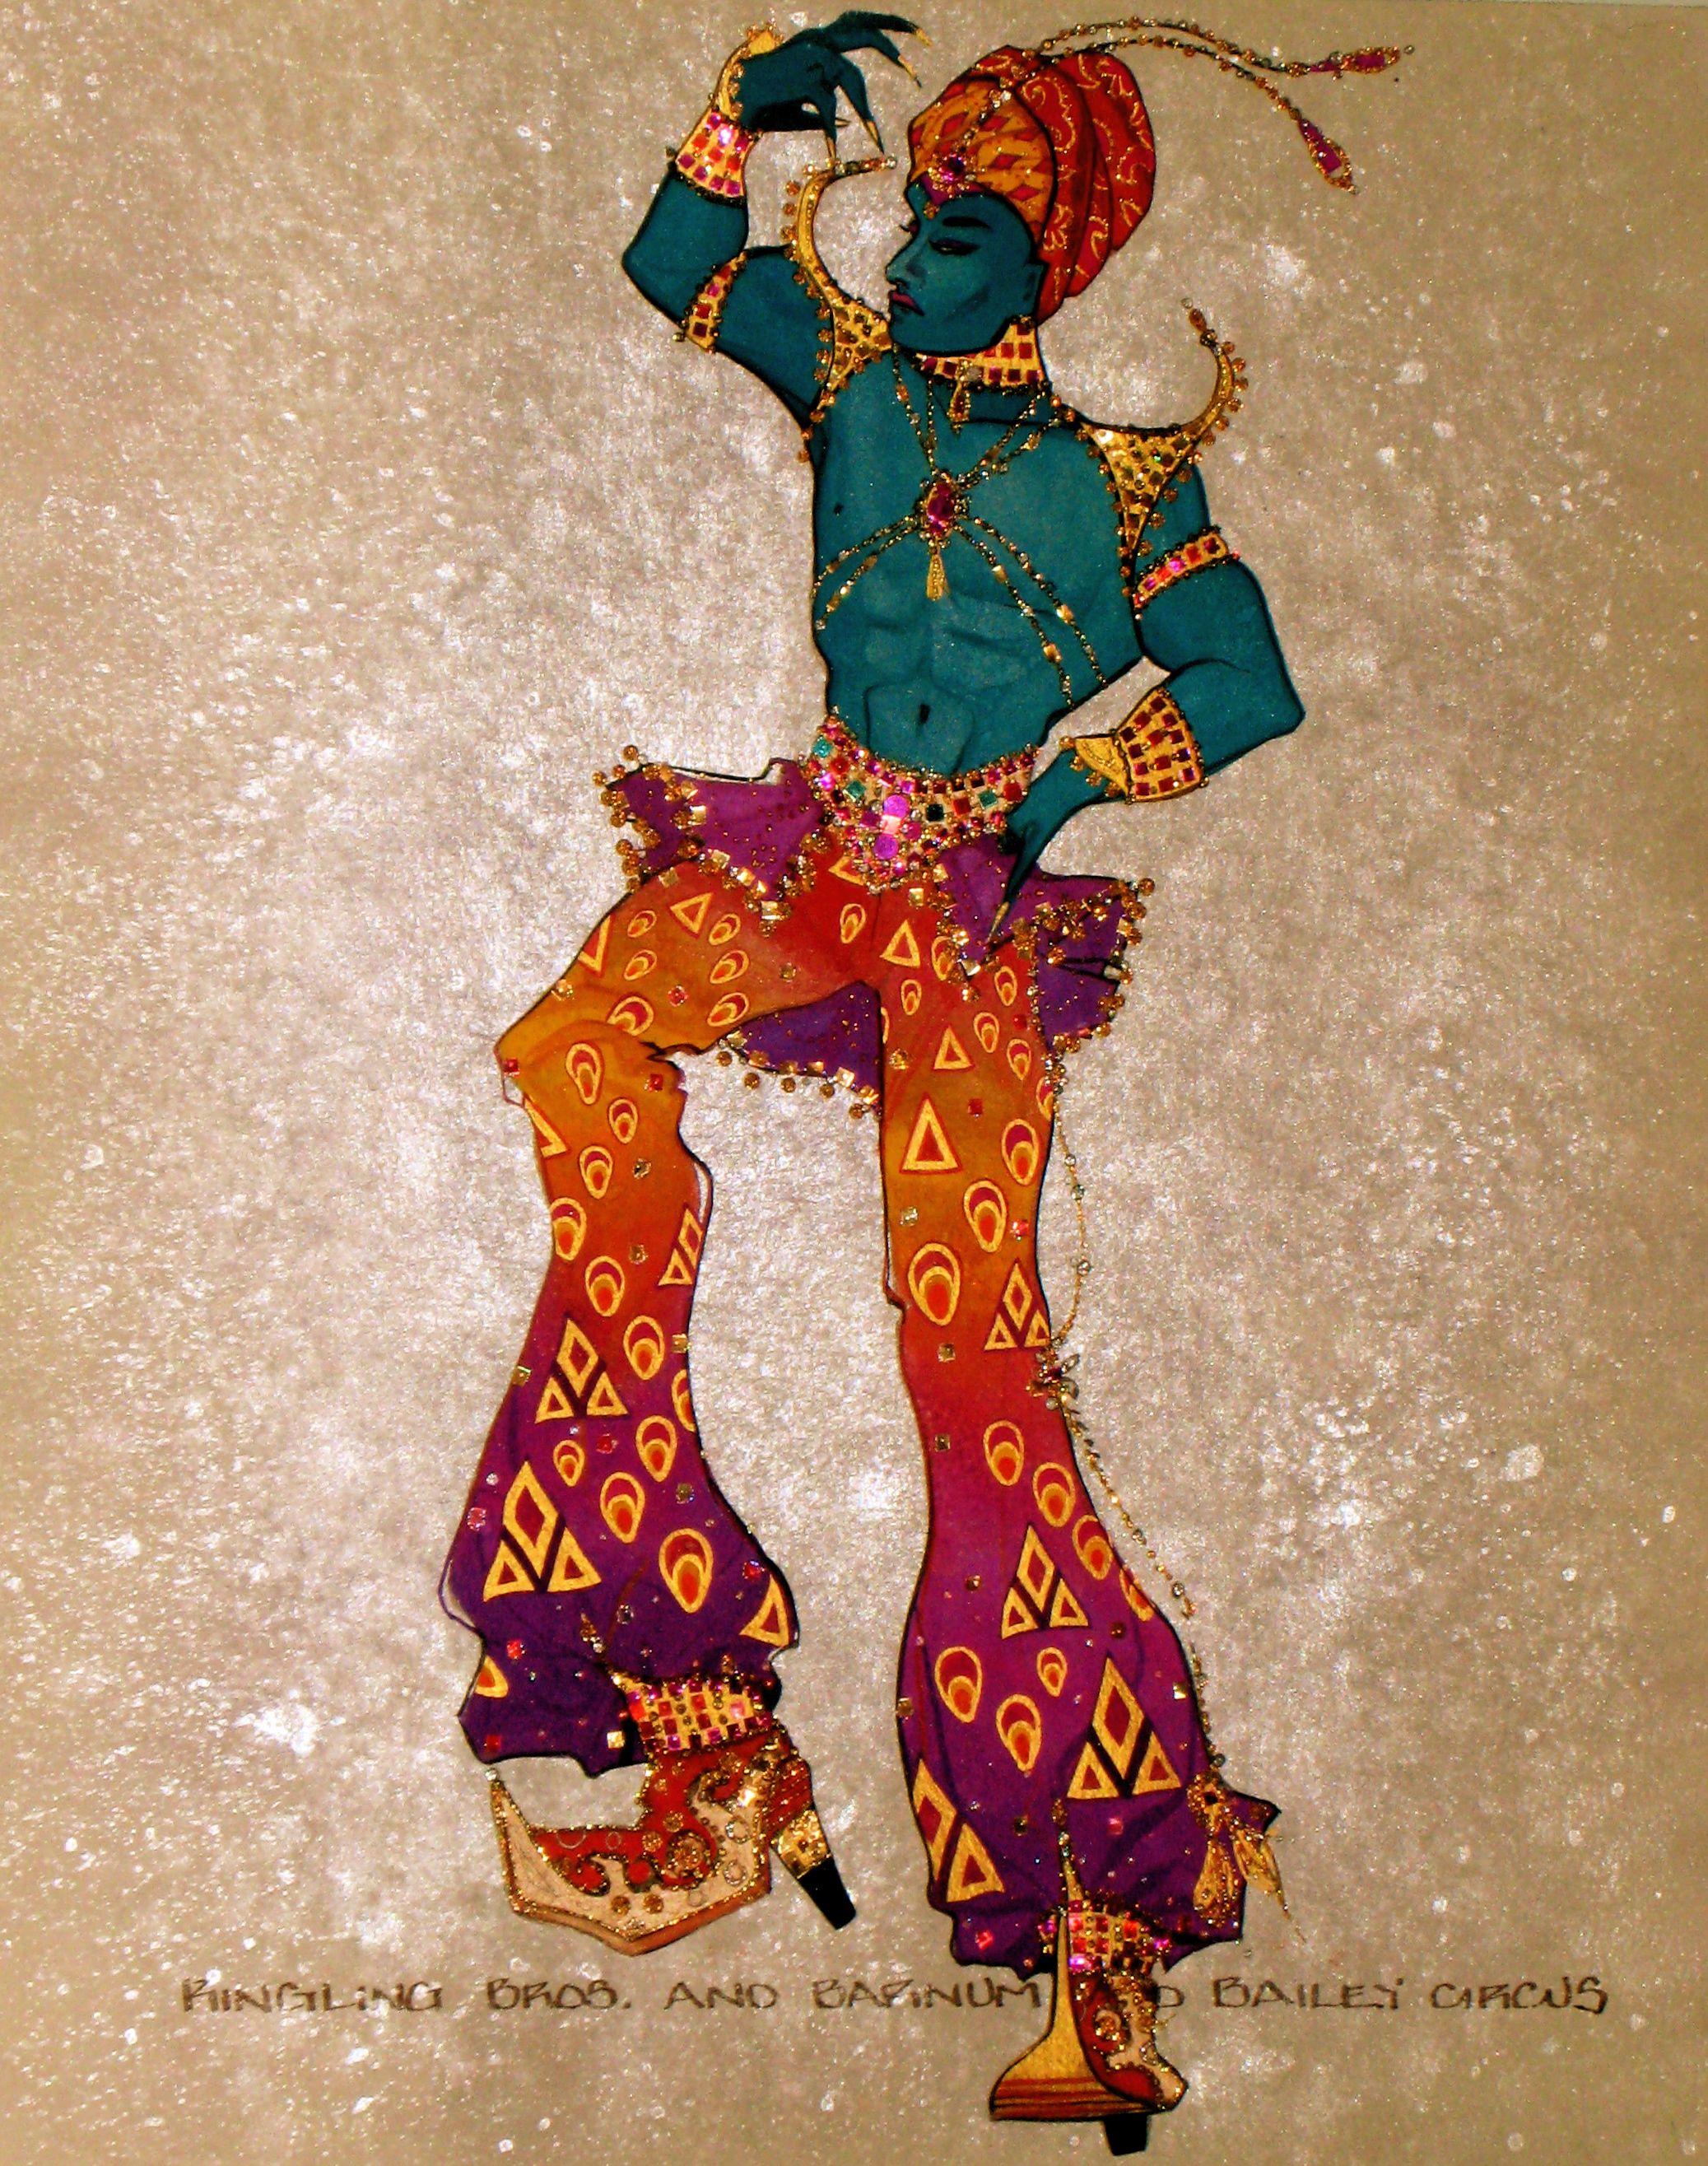 Ringling Bros. Circus costume design by Gregg Barnes